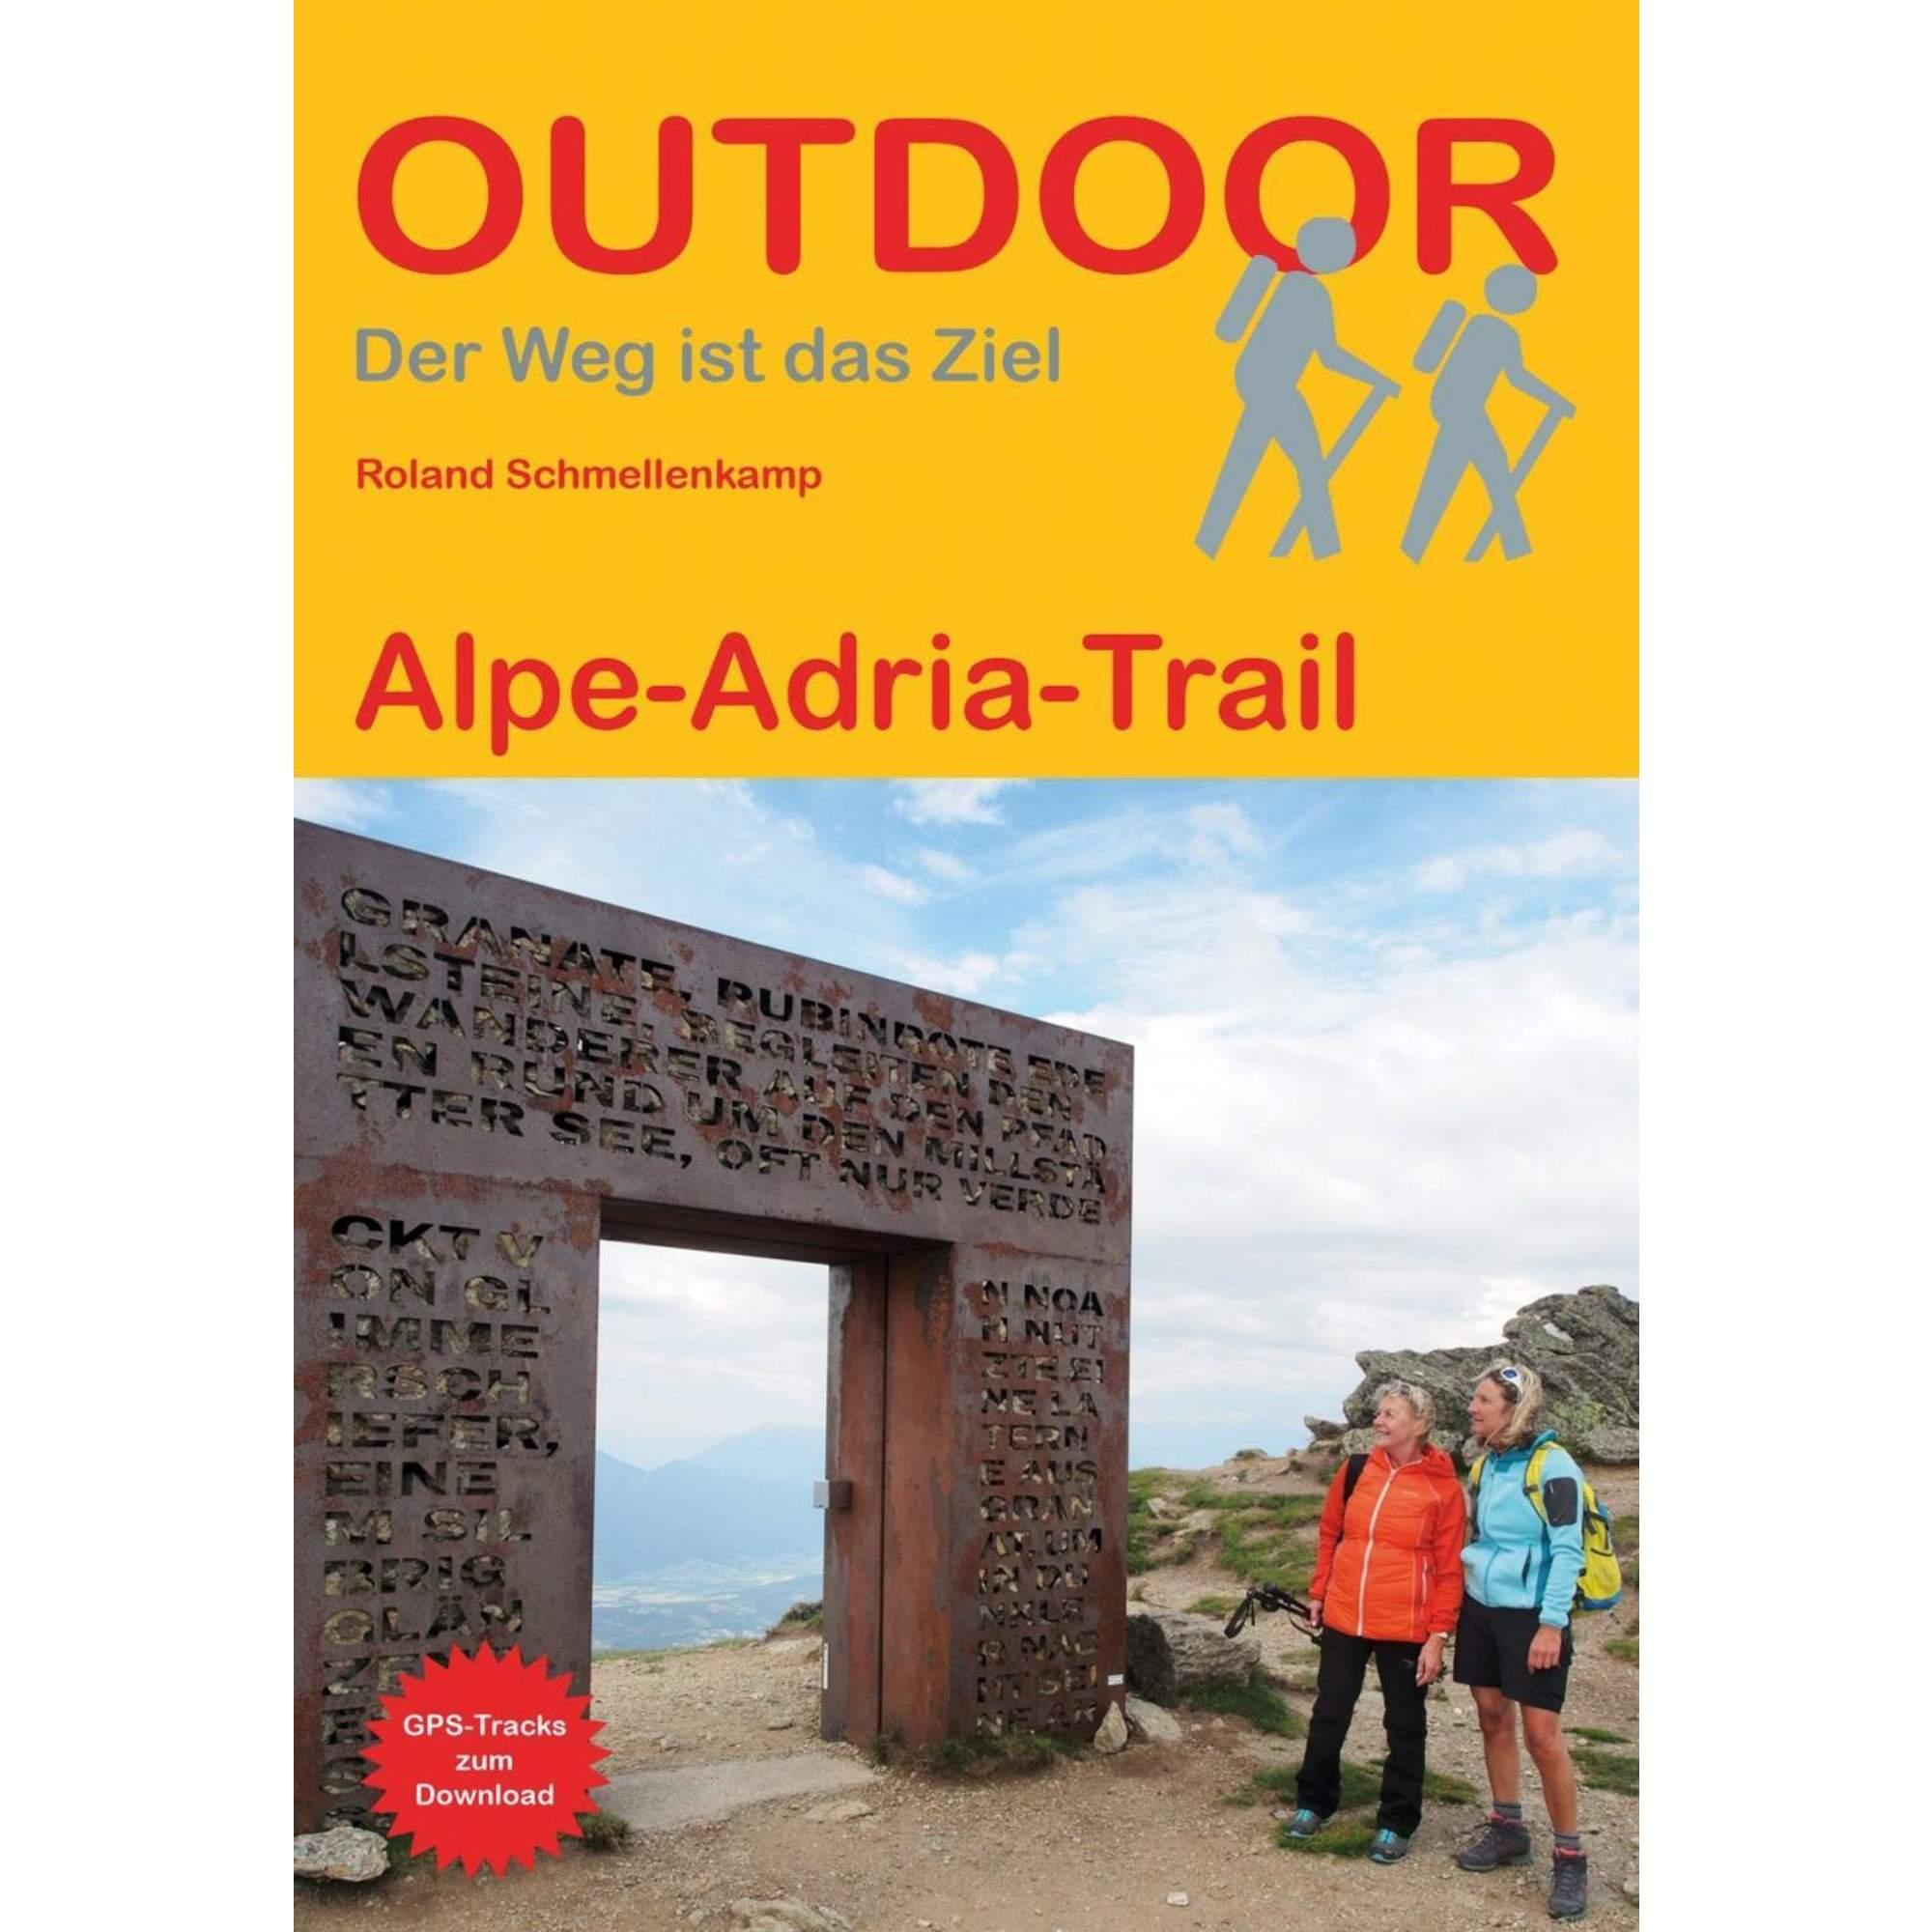 Alpe-Adria-Trail, 16,90 Euro